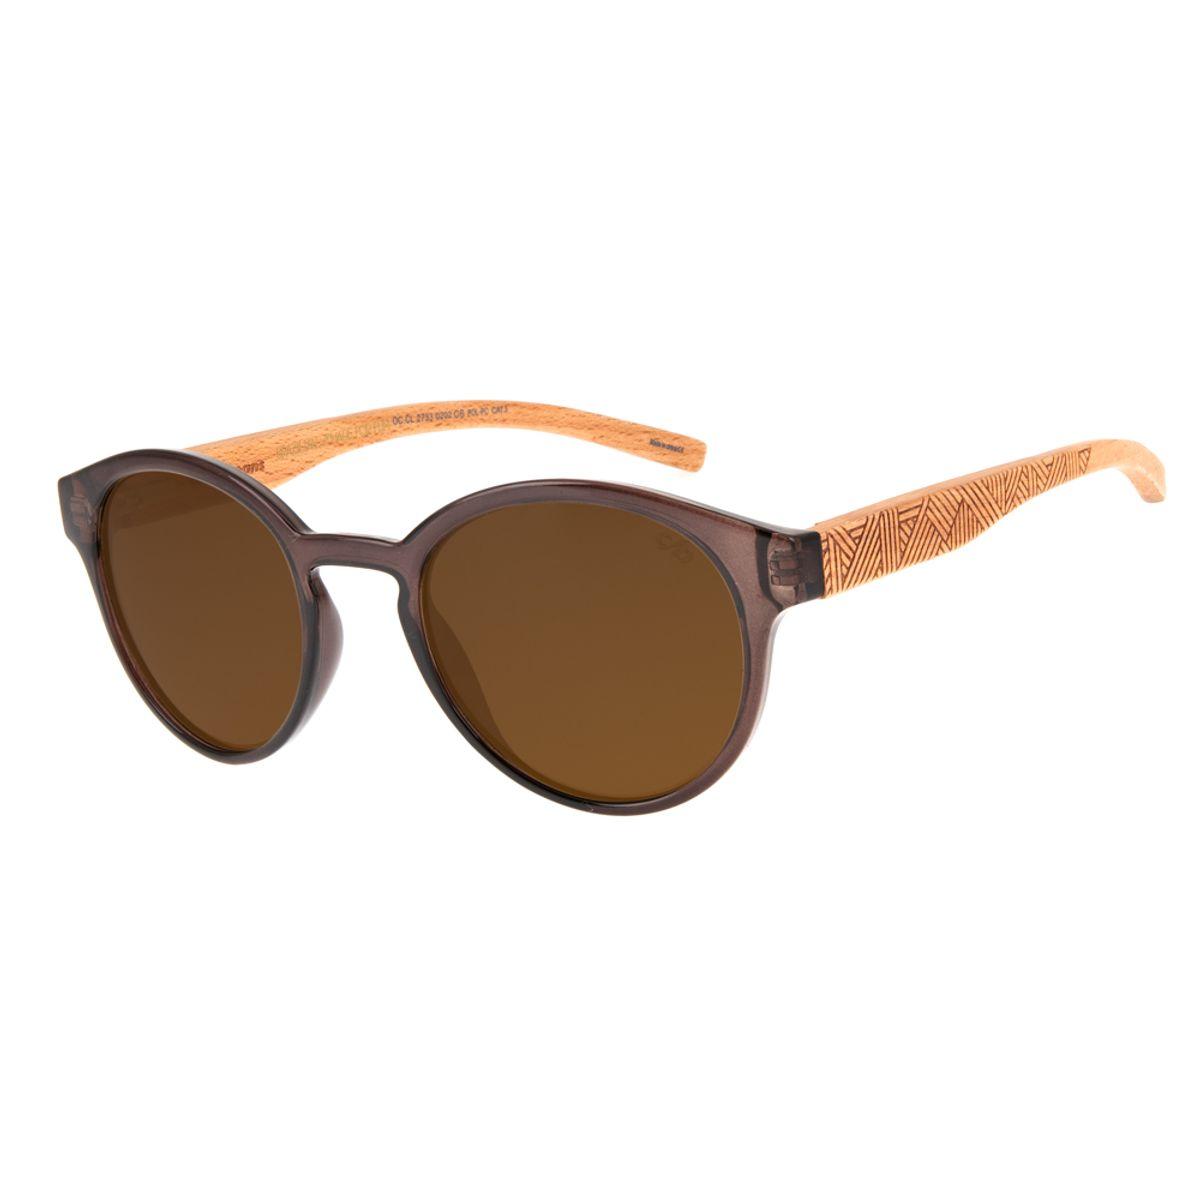 edb5e1338c0e0 Óculos de Sol Chilli Beans Masculino Arte de Rua Cranio Marrom Bambu ...